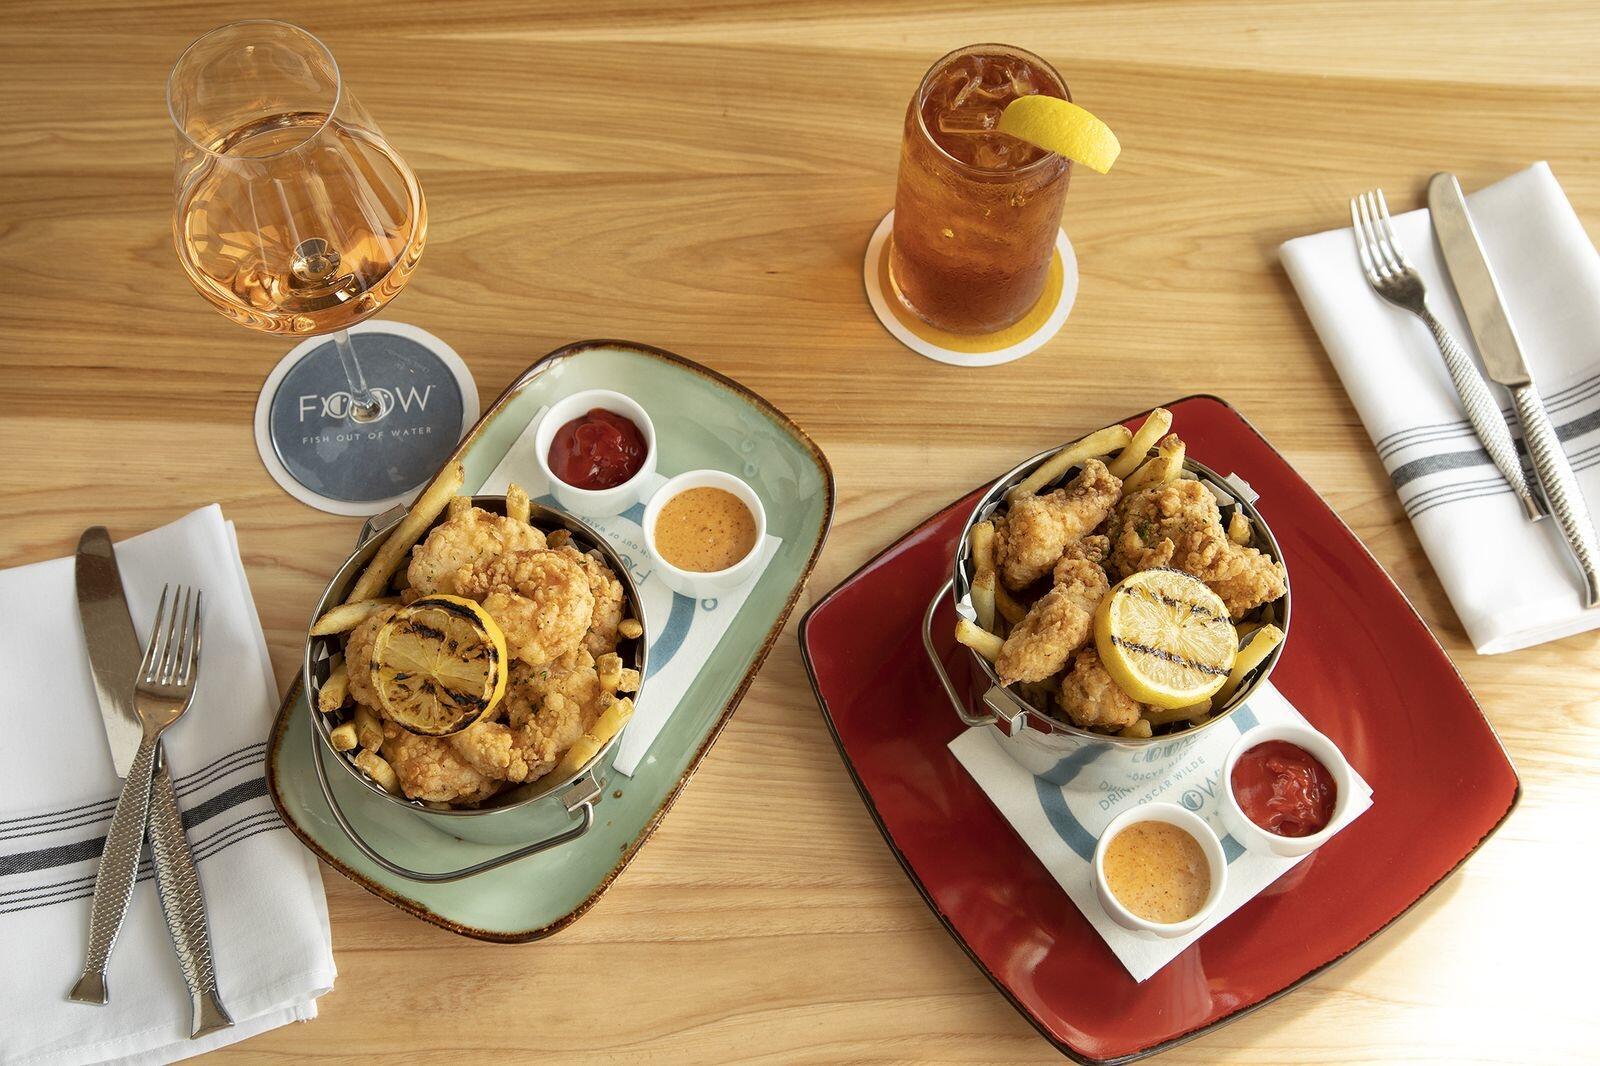 Platters of food buckets